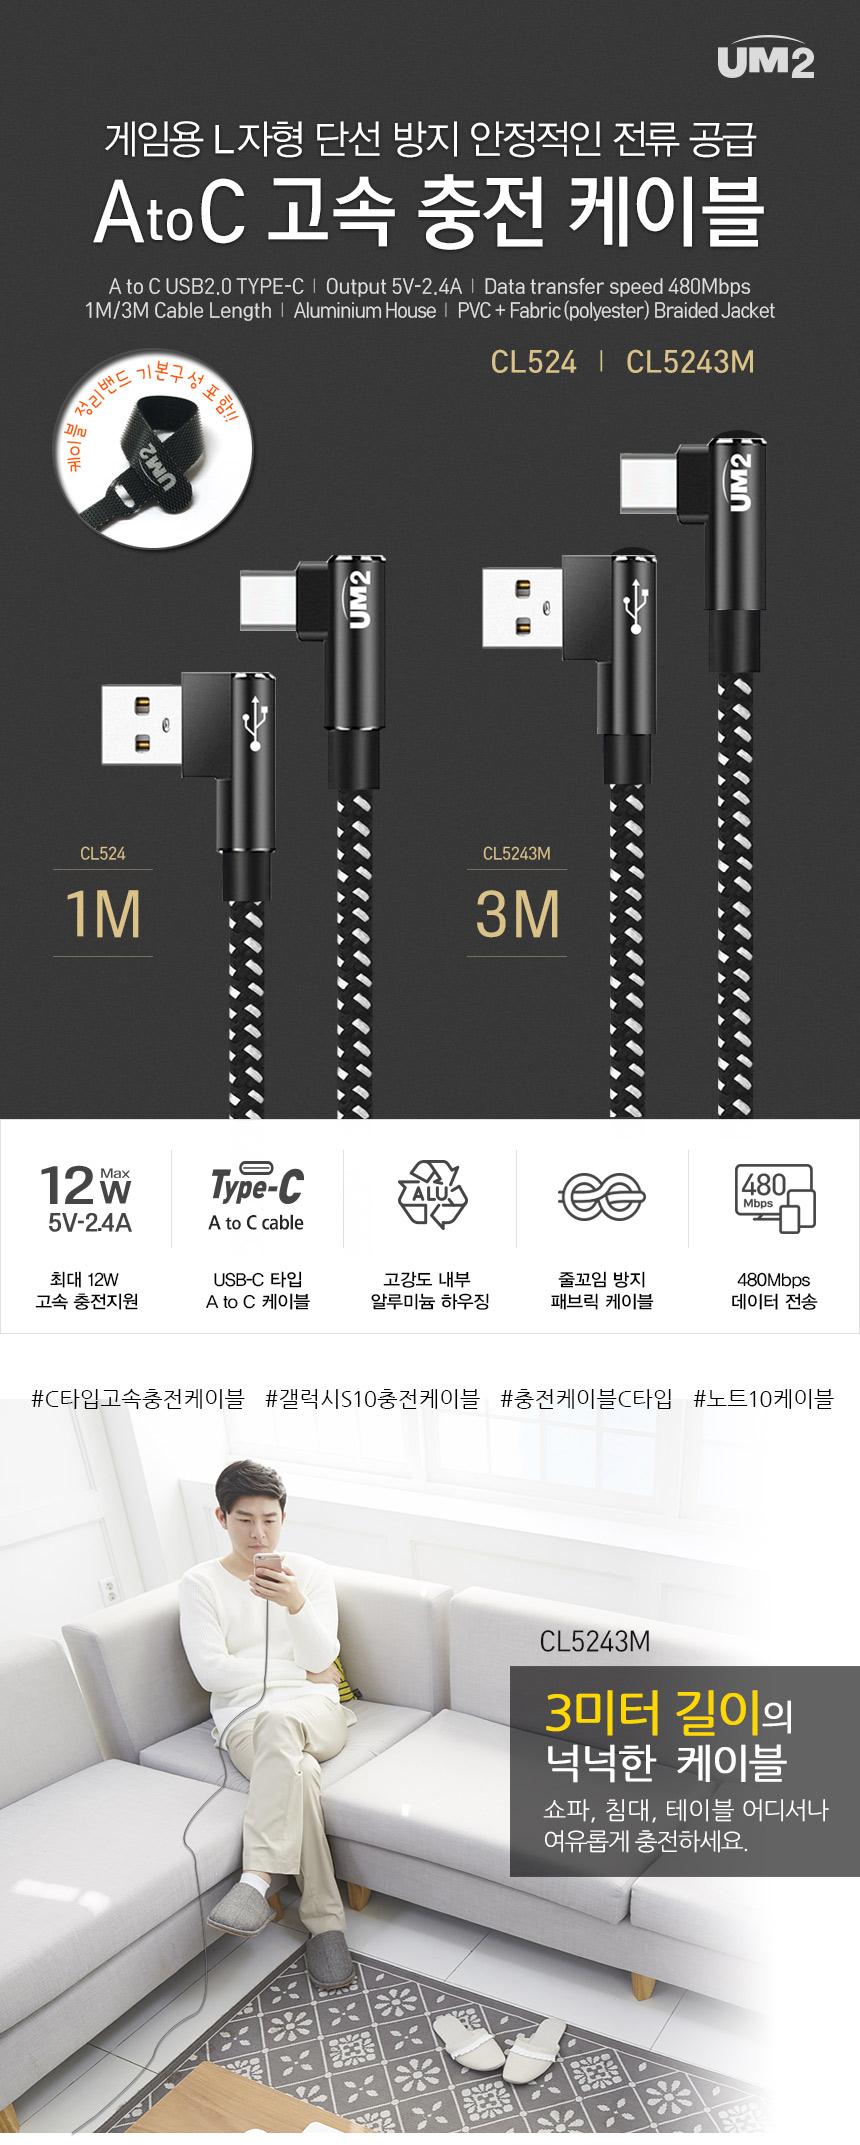 UM2 C타입 게이밍 90도 고속 충전케이블 휴대폰충전 3M - 에스엔, 7,200원, 케이블, C타입